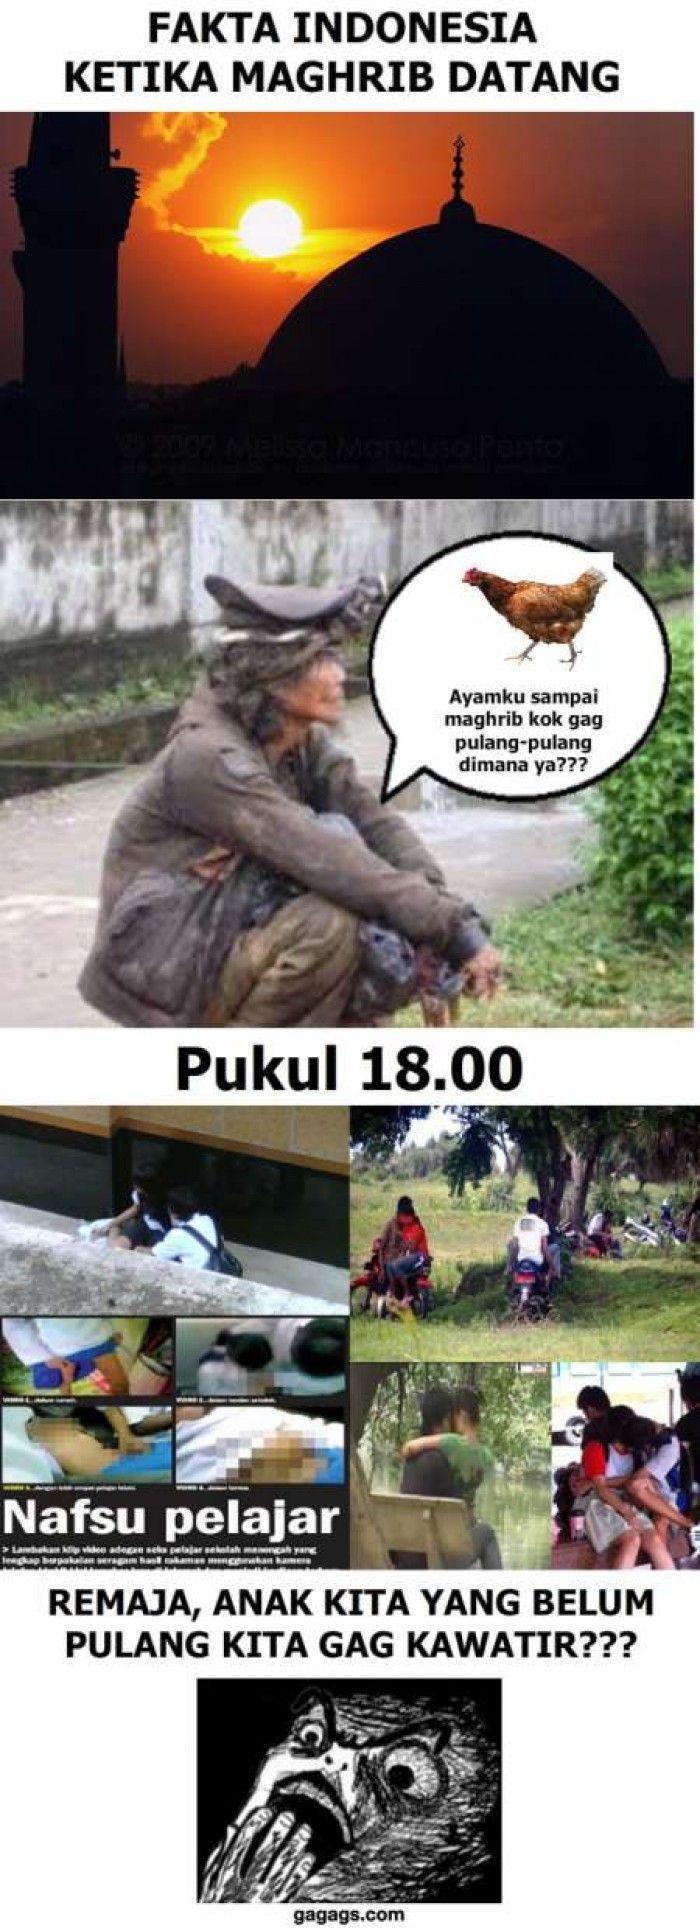 Fakta Indonesia Ketika Maghri Tiba